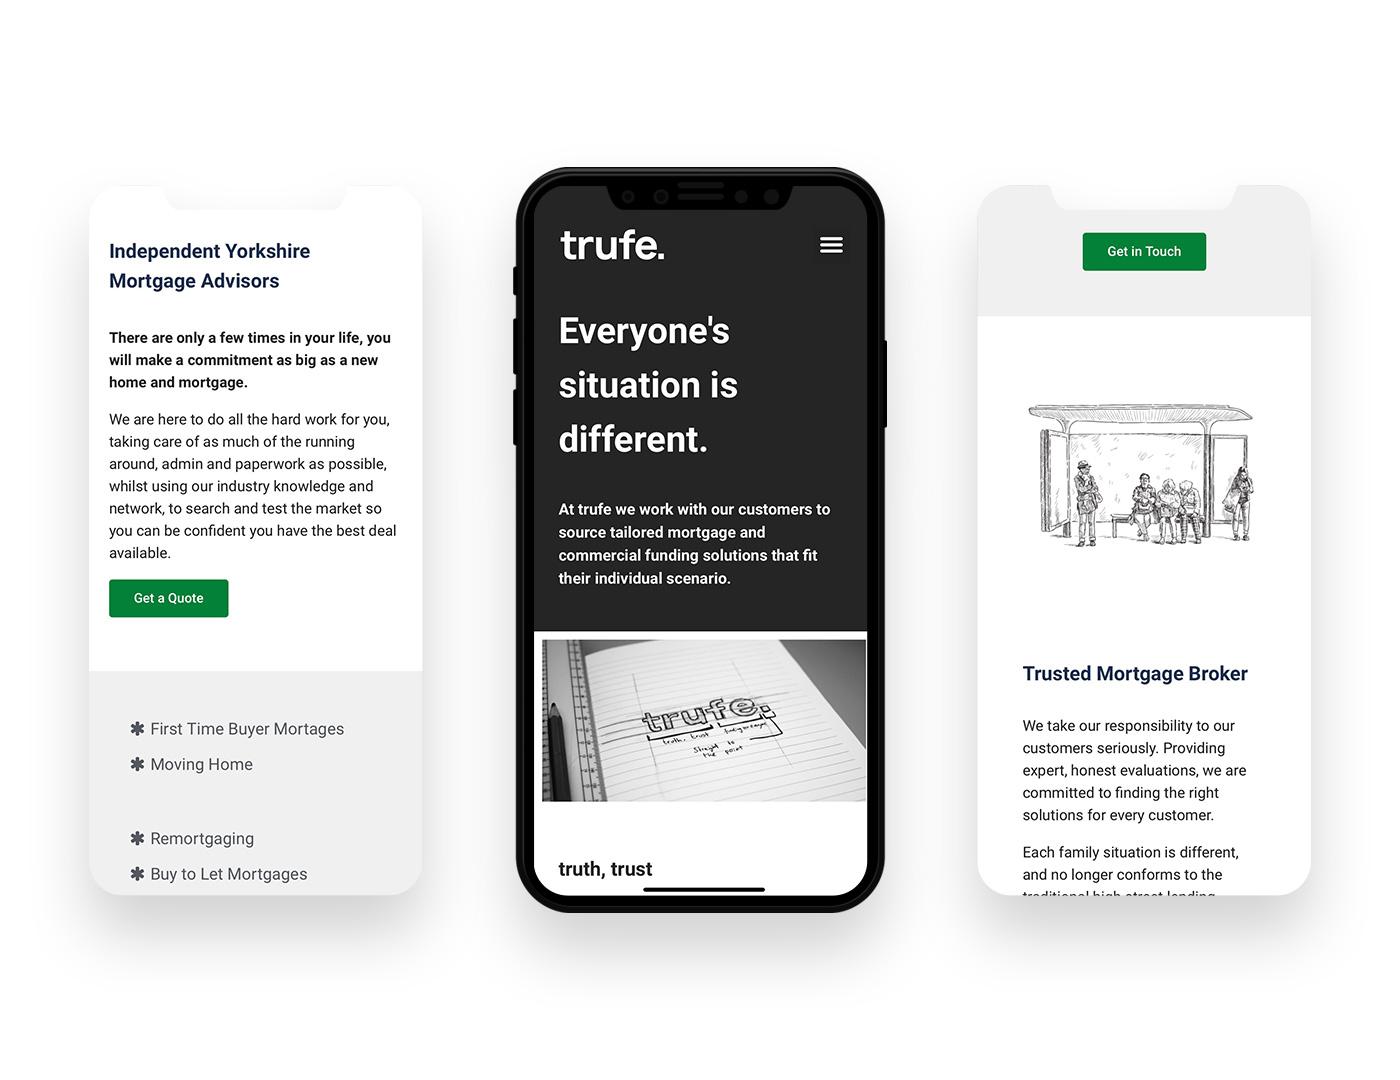 Mobile device screenshot of trufe.co.uk